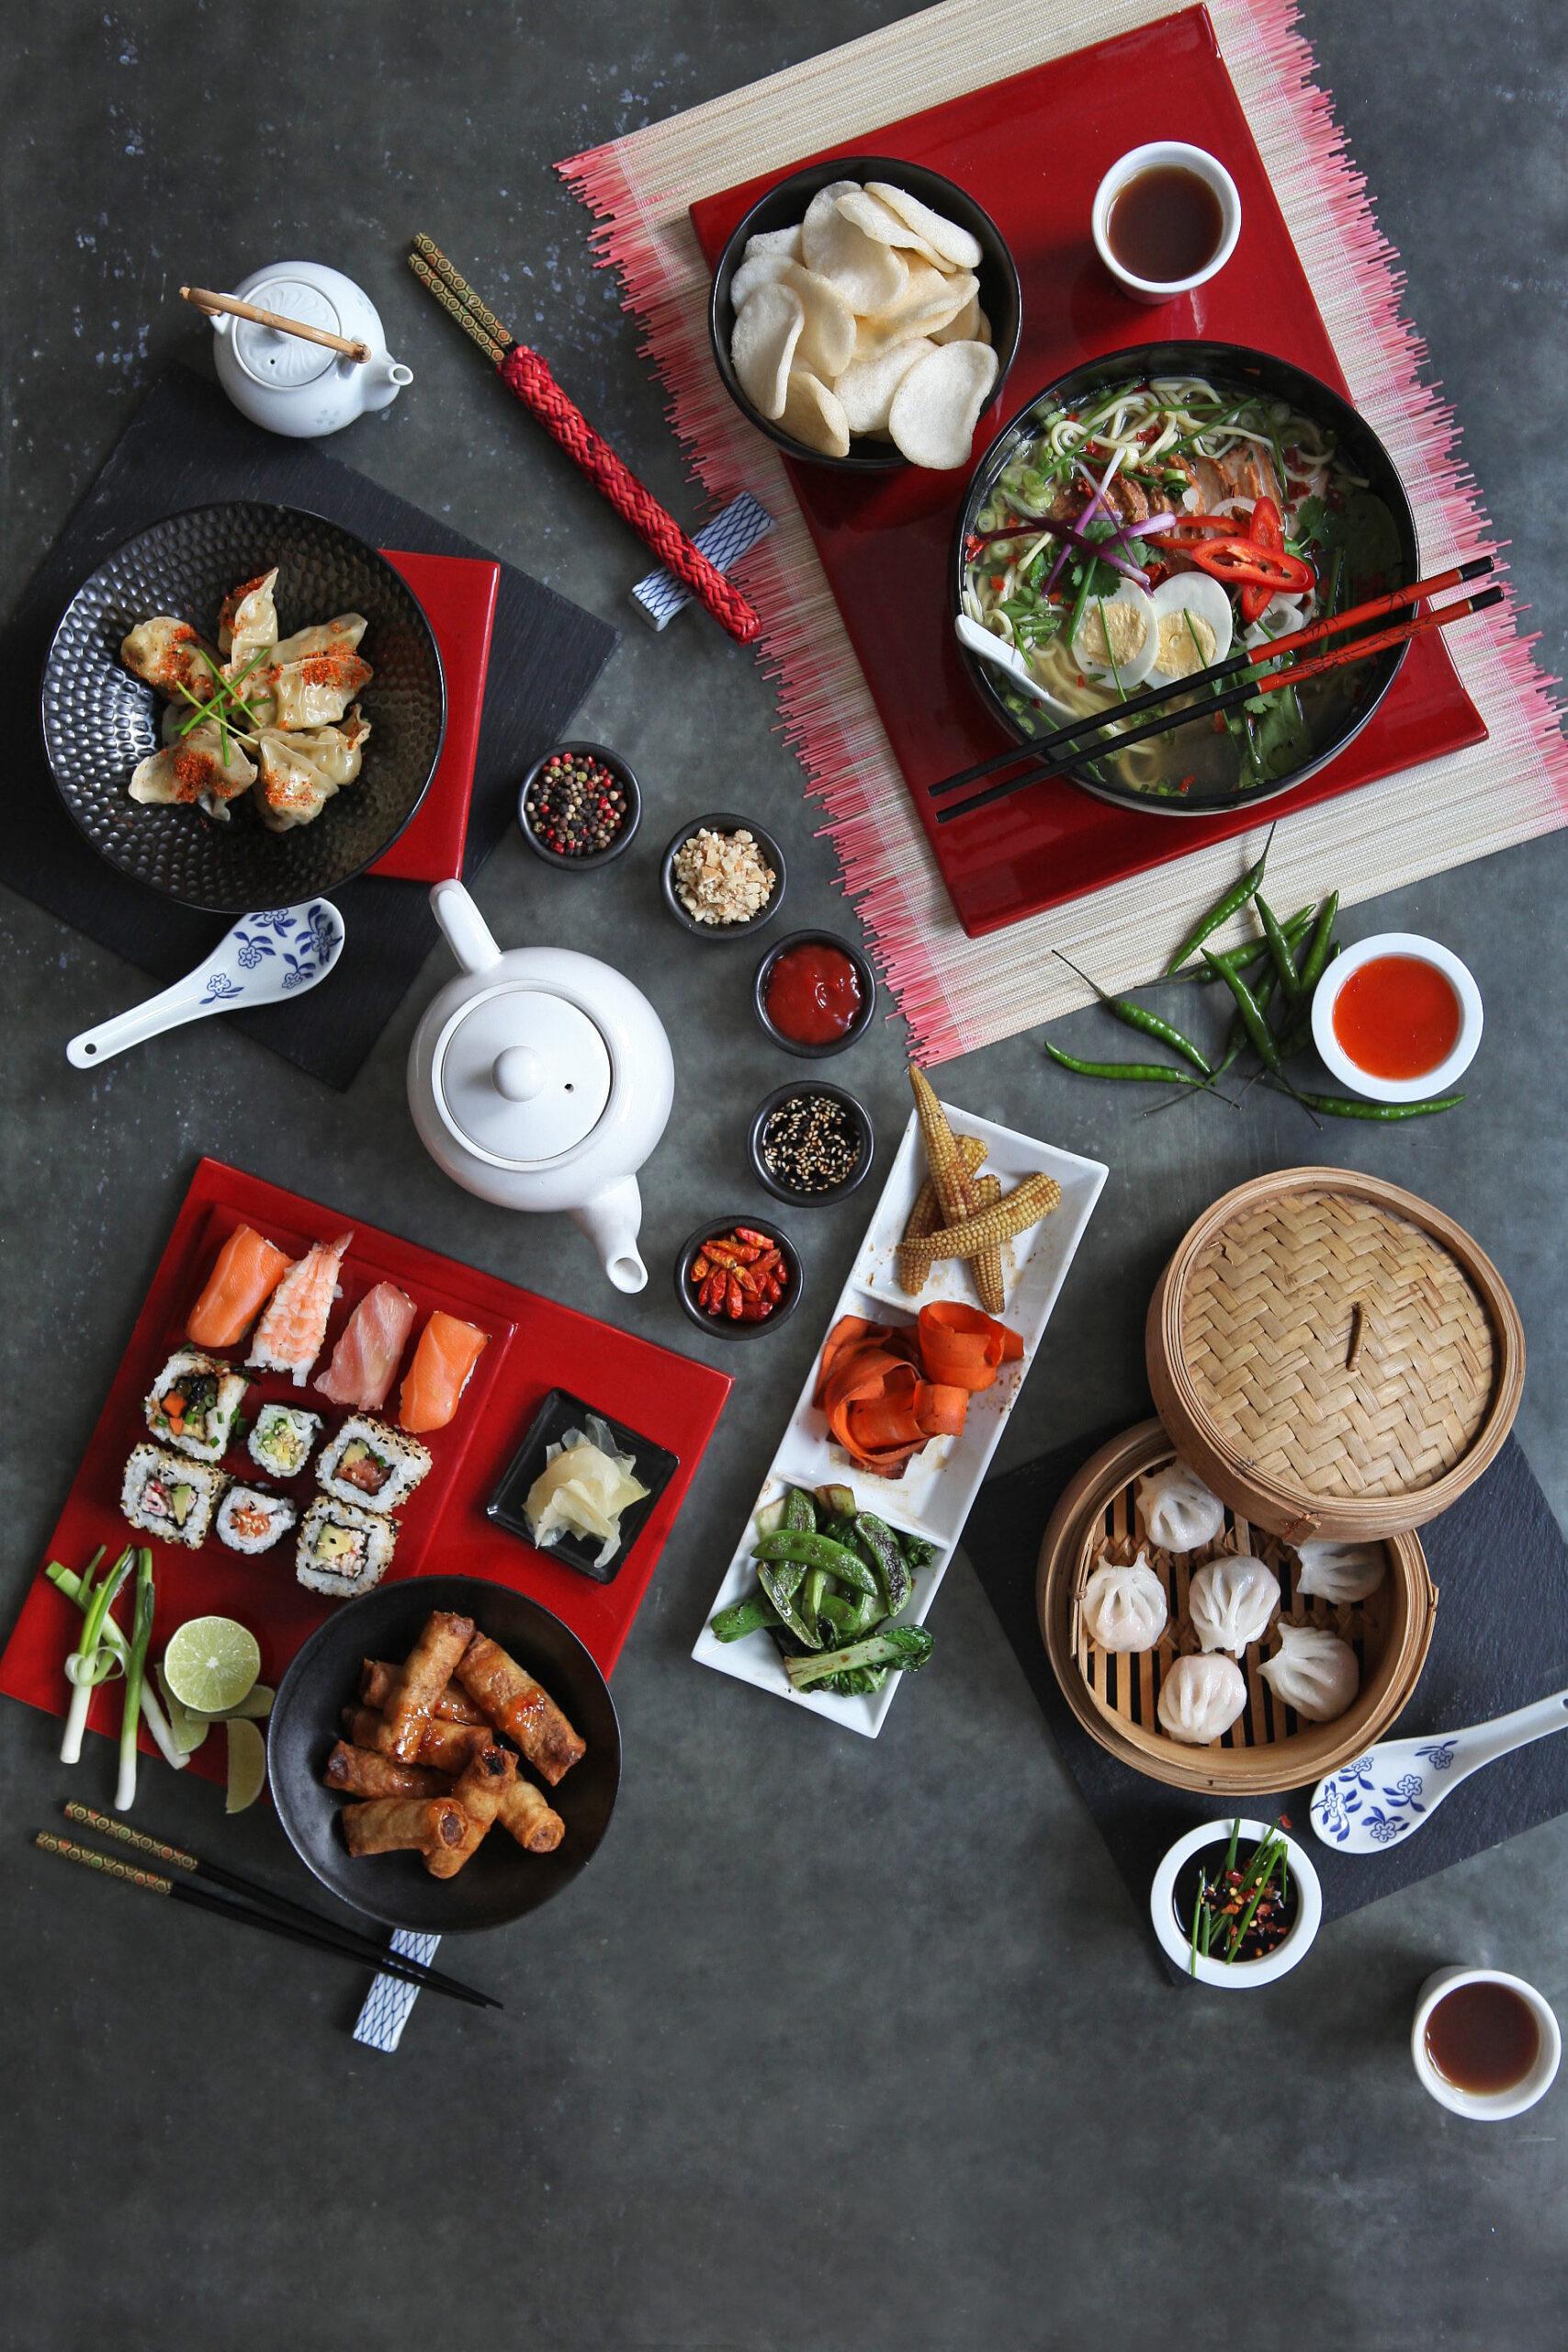 CHINESE FOOD FLATLAY